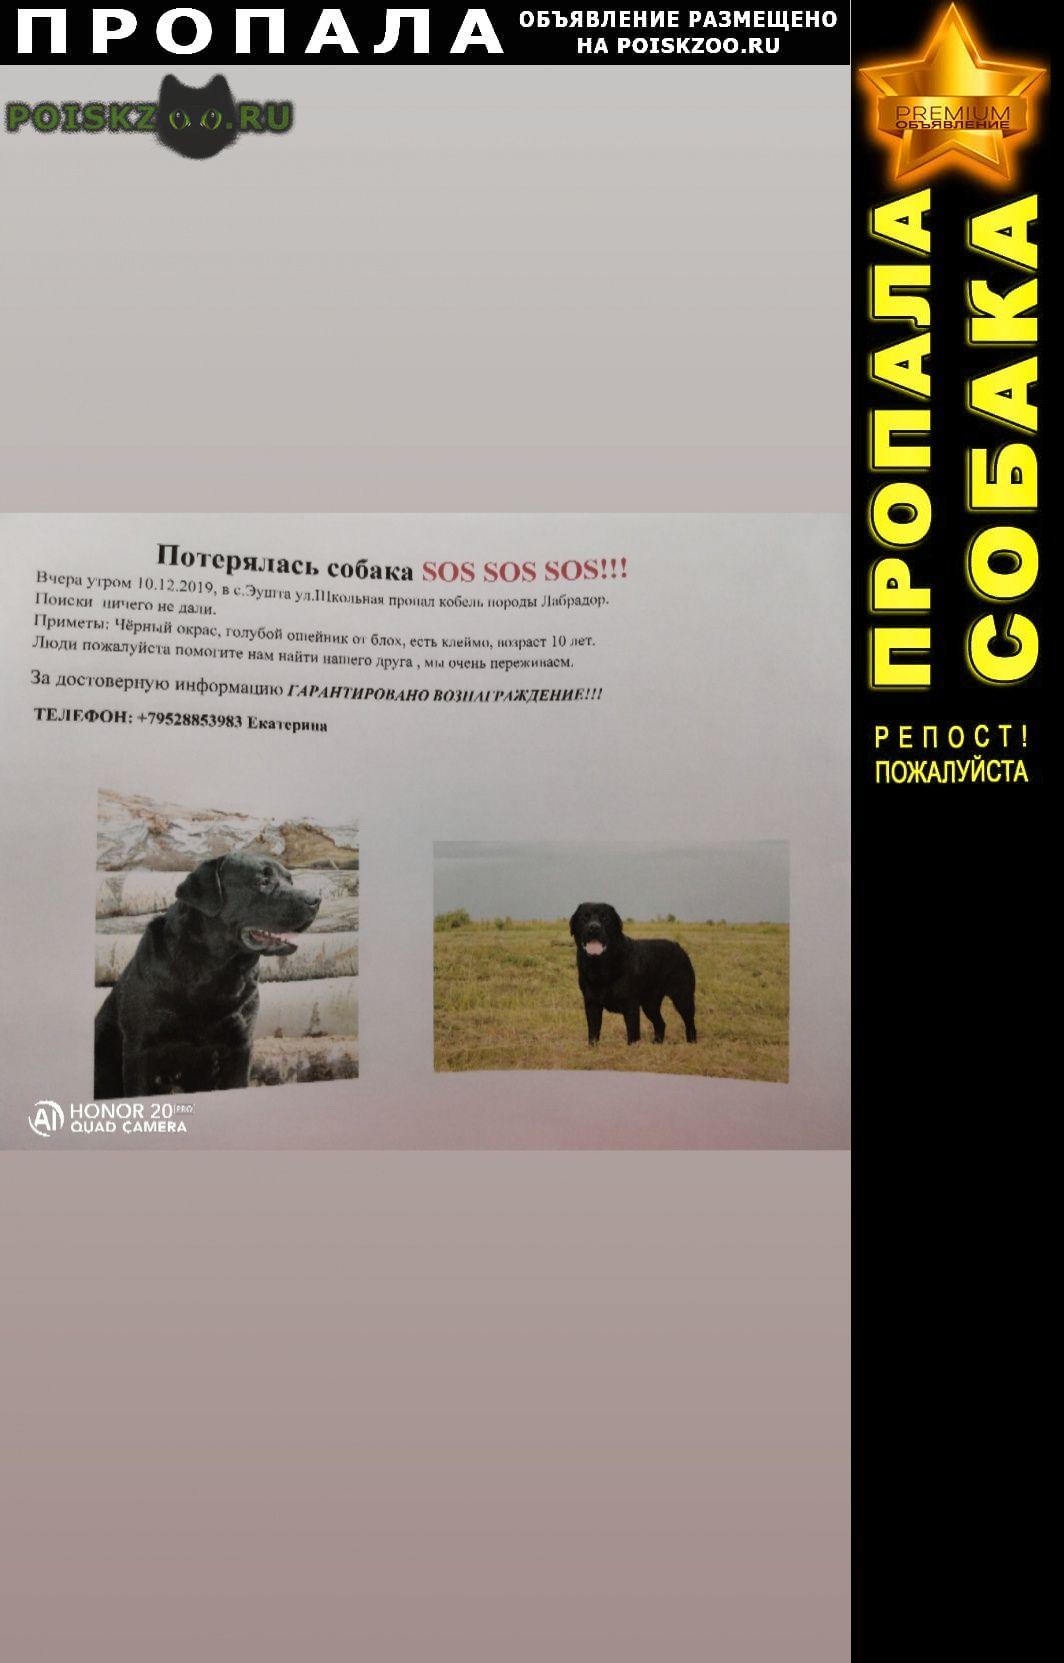 Пропала собака кобель лабрадор. г.Томск